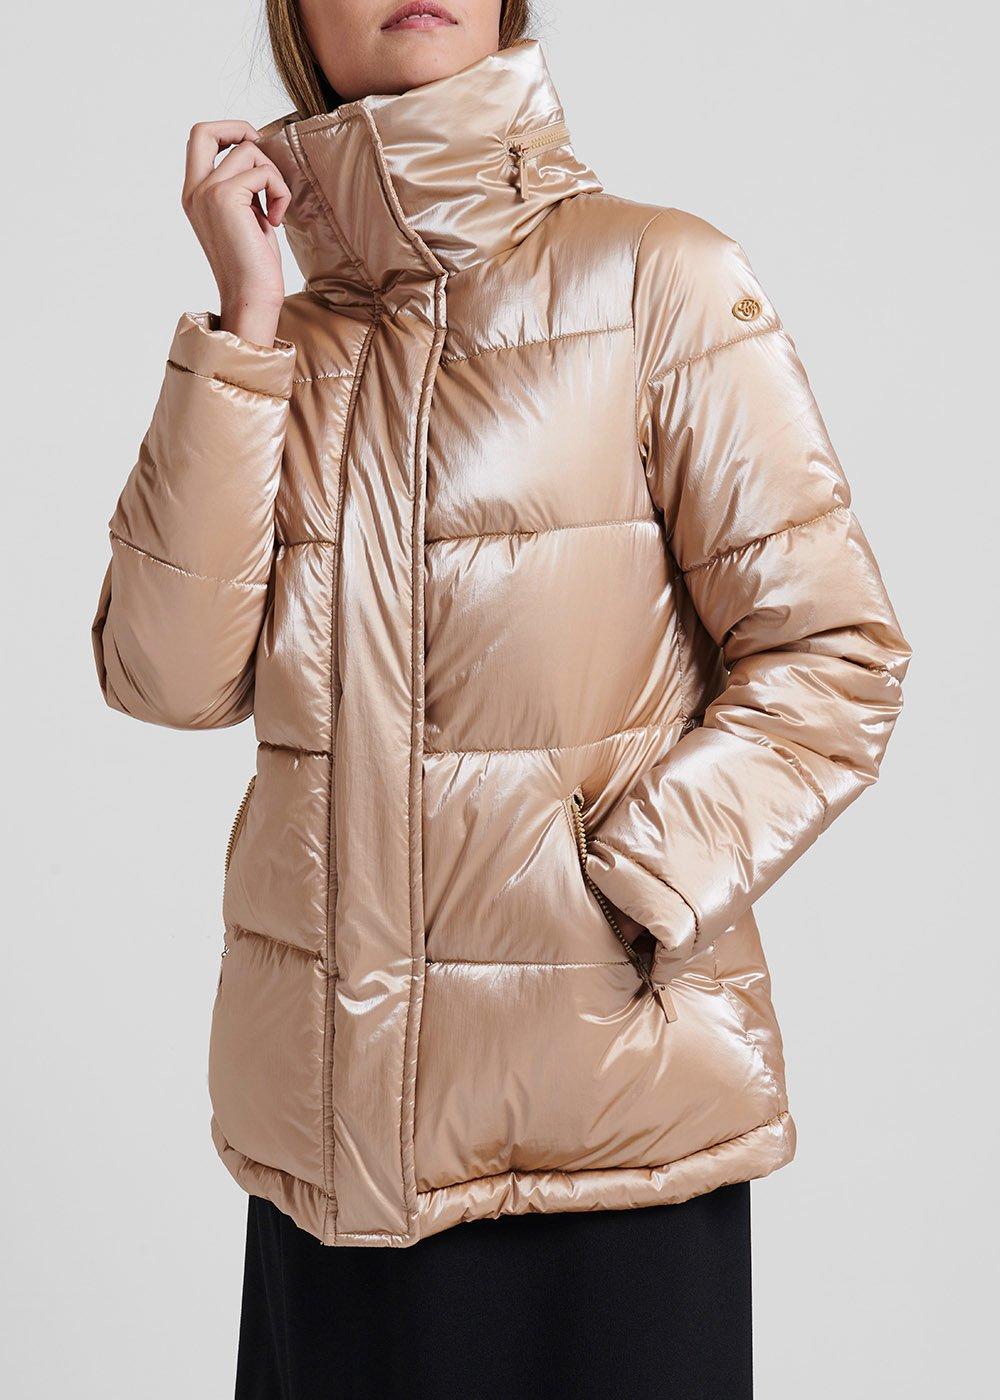 Down jacket in metal-effect fabric with hood - Beige - Woman